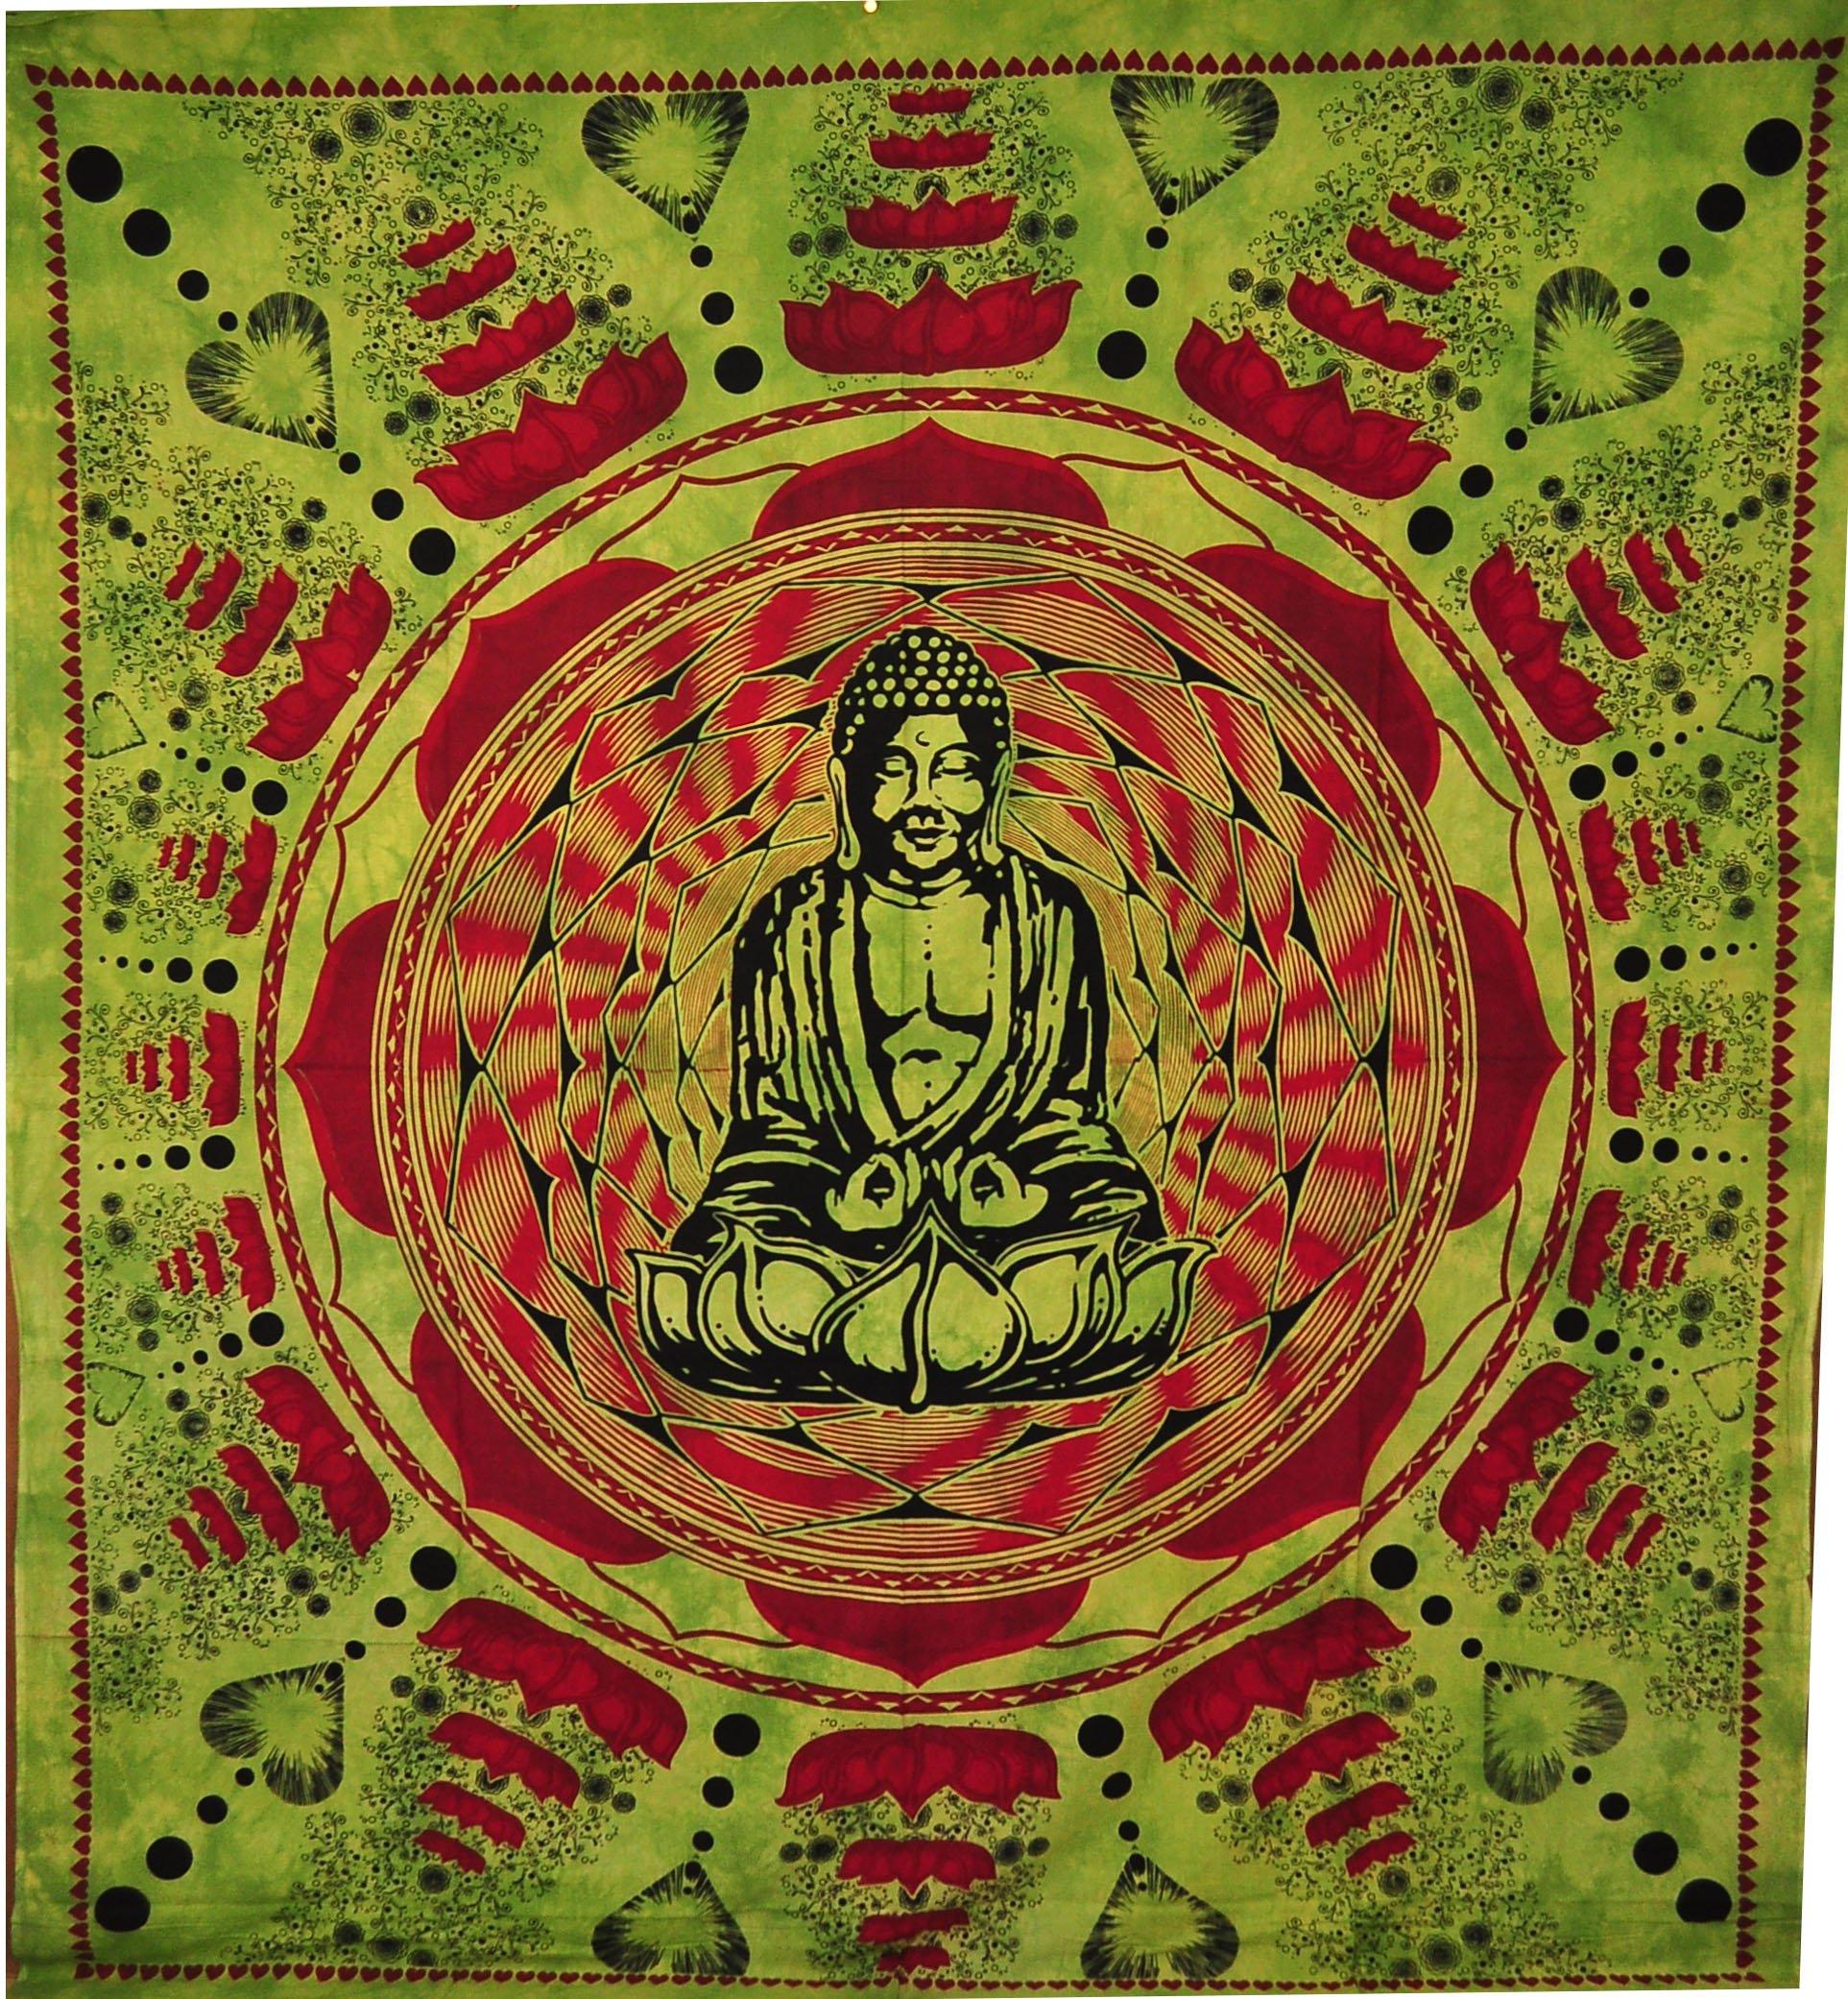 96 x 80 BEDSPREAD COVERLET WALL HANGING TAPESTRY Buddha mandala Hippy India Decor